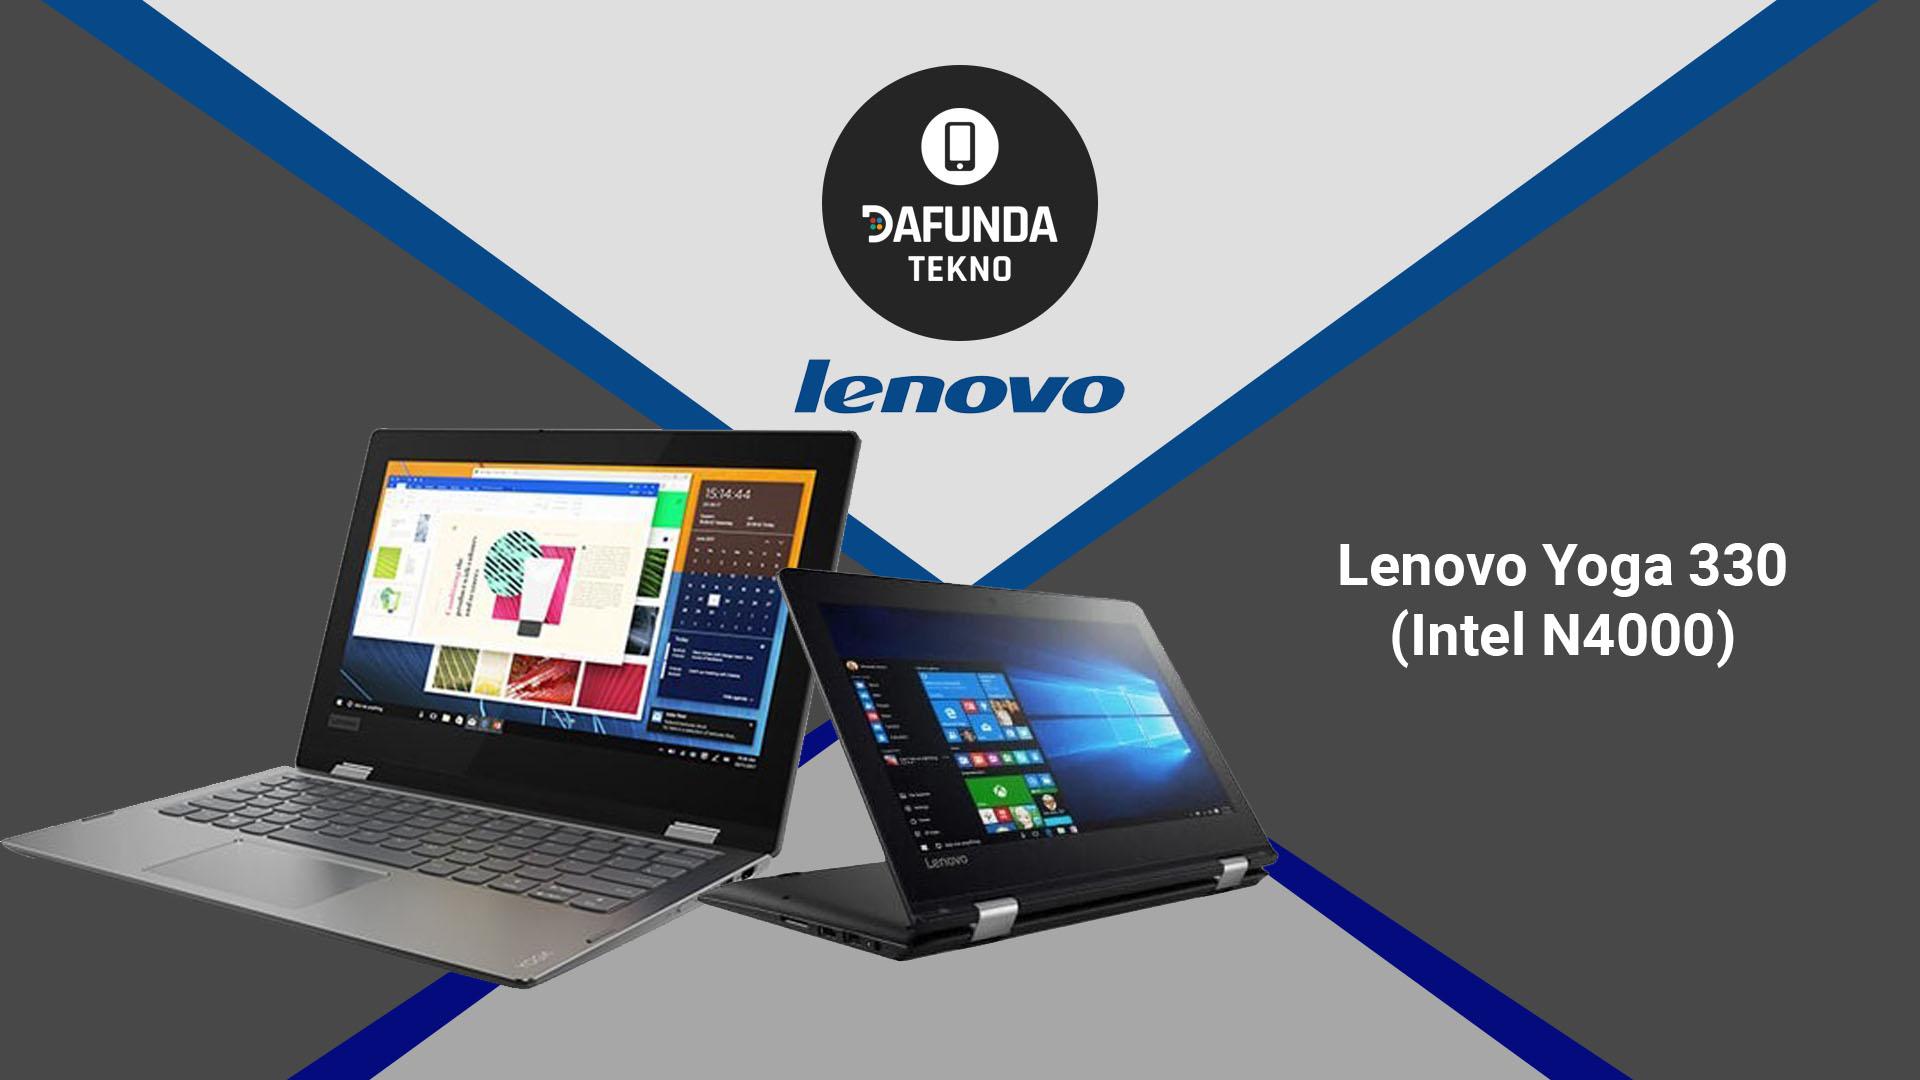 Lenovo Yoga 330 Intel N4000